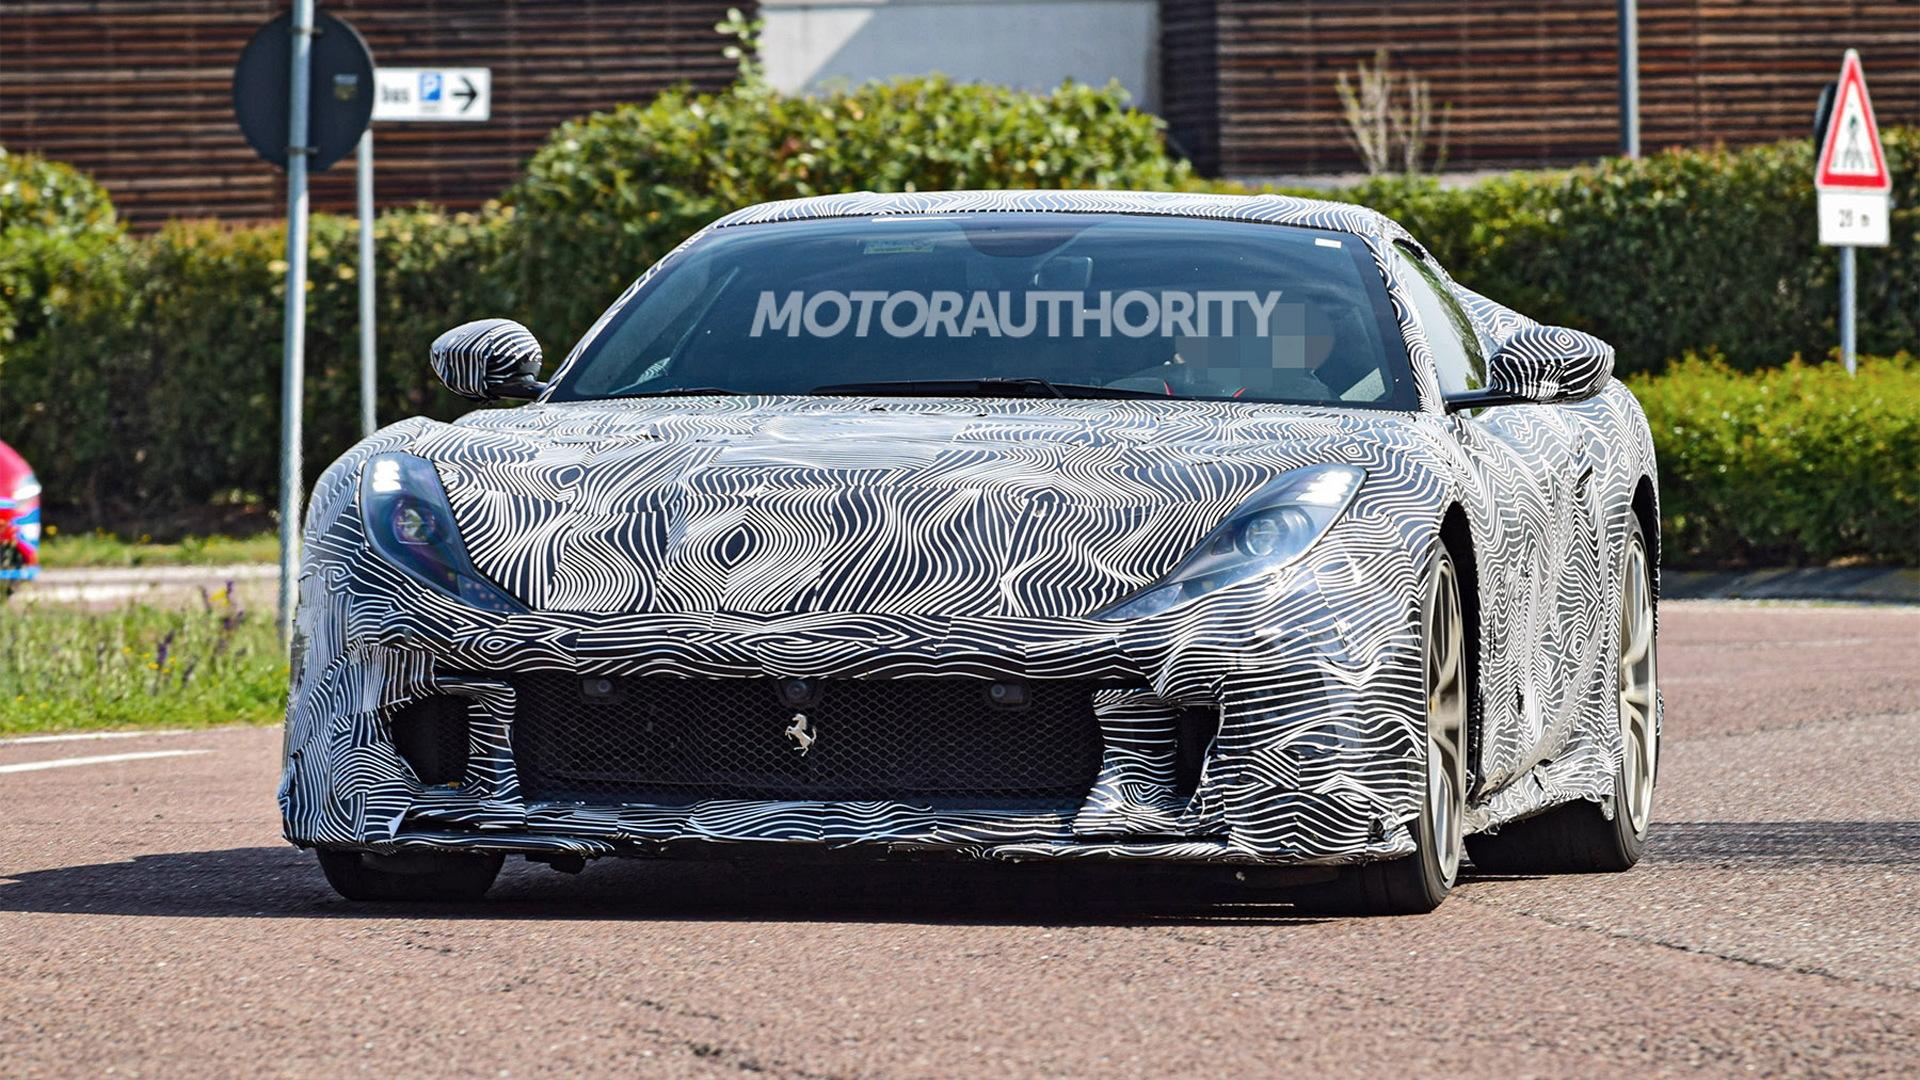 2022 Ferrari 812 GTO (Versione Speciale) spy shots - Photo credit:S. Baldauf/SB-Medien